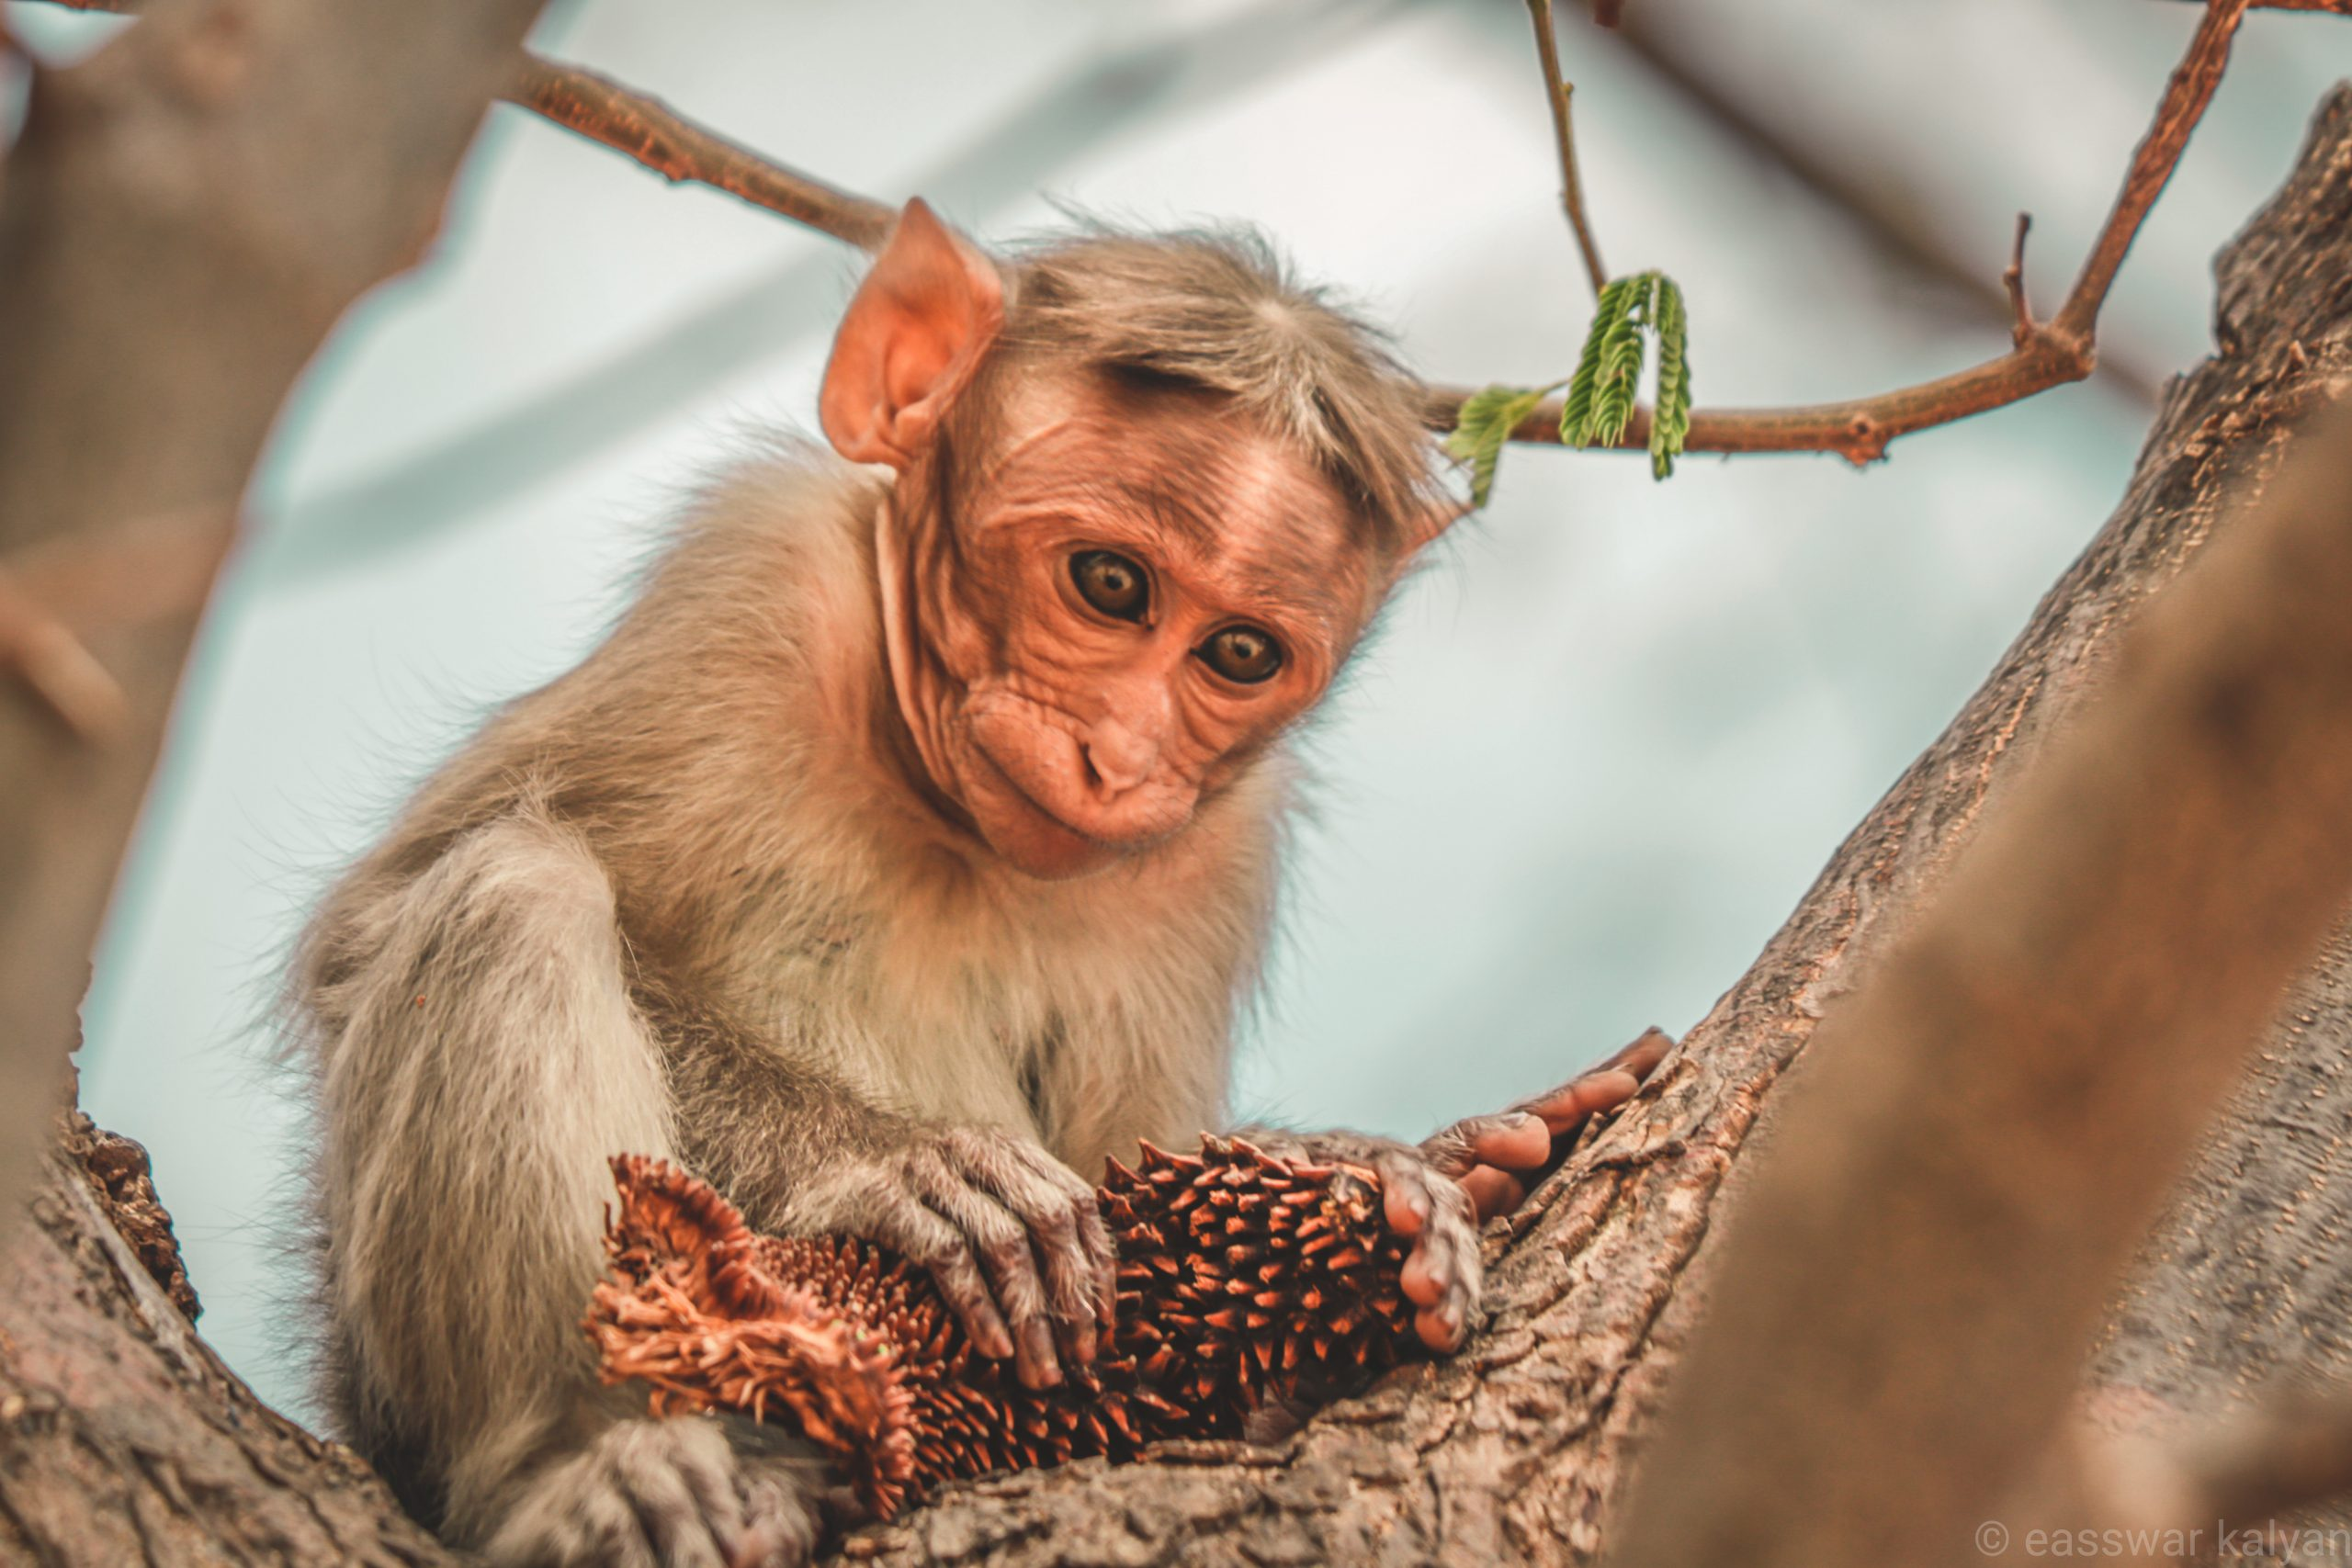 Monkey sitting on a branch.